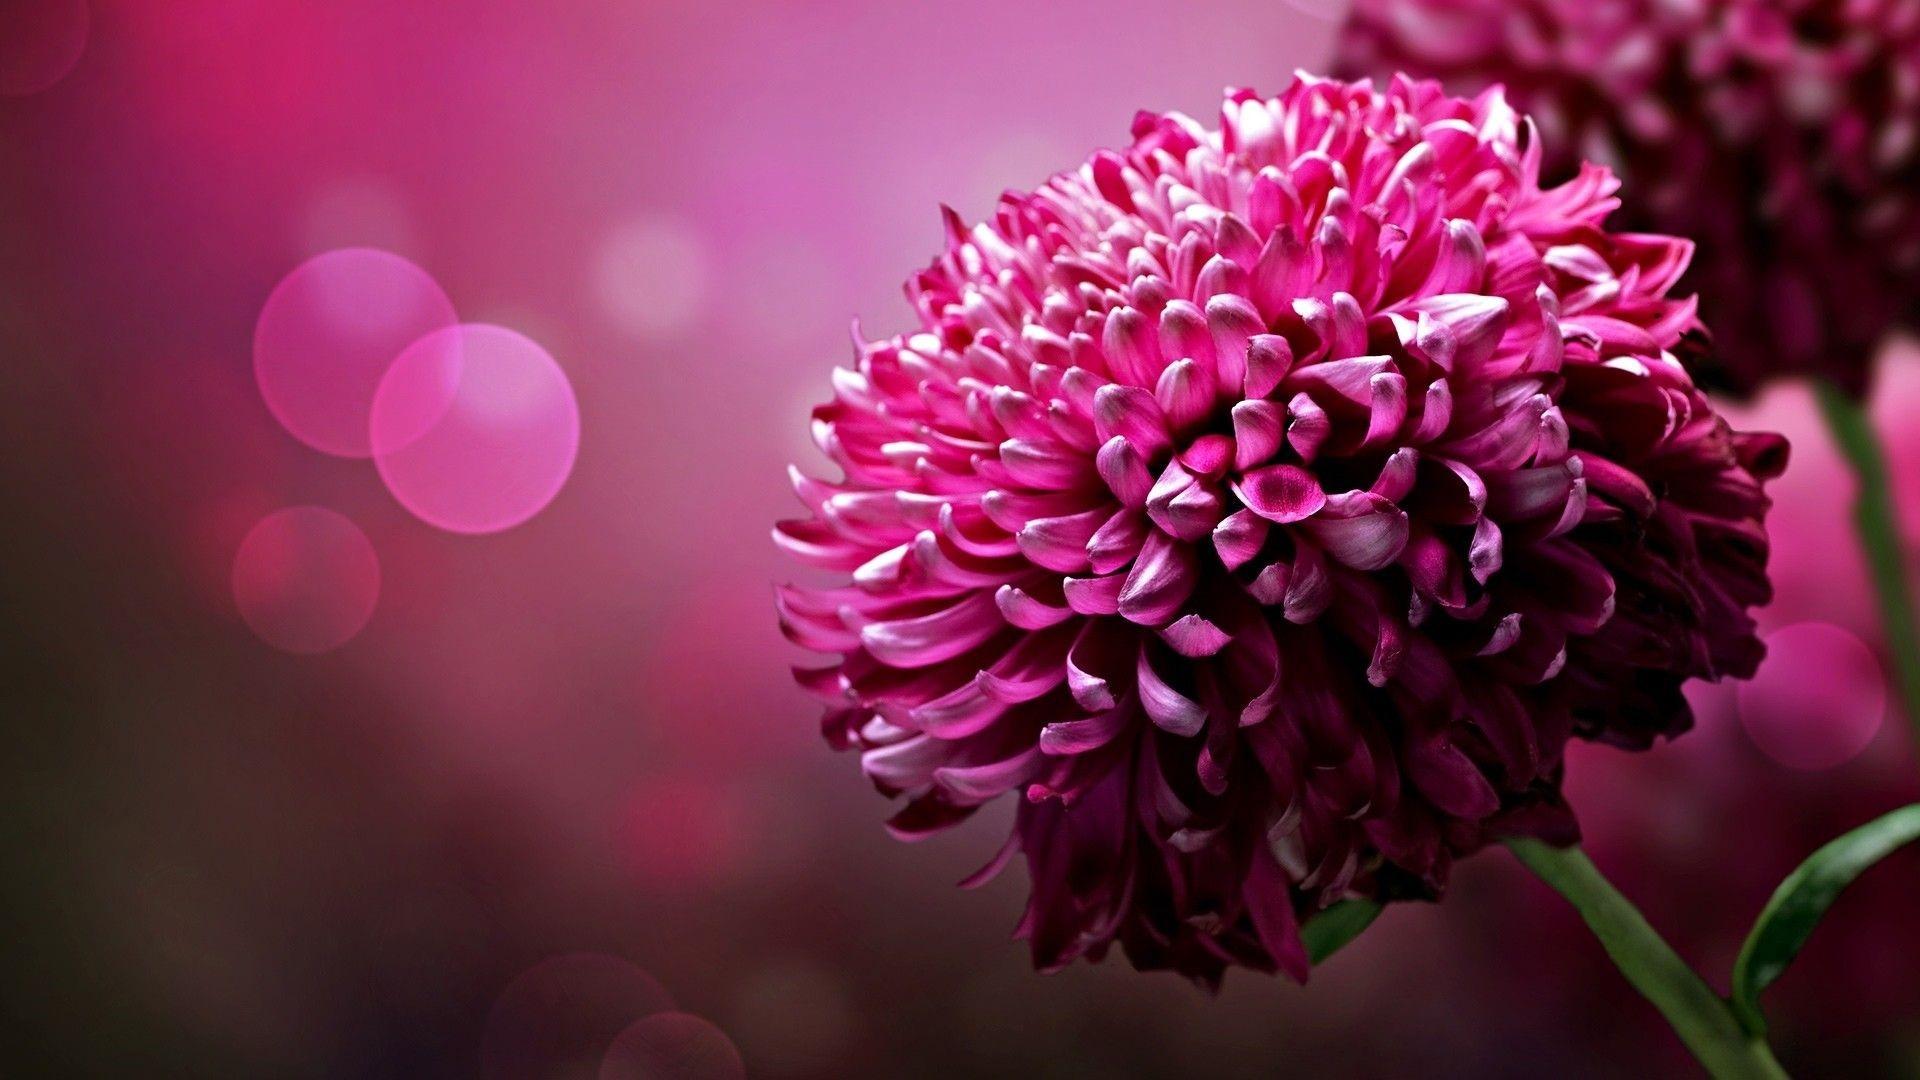 Spring HD Flowers Wallpaper